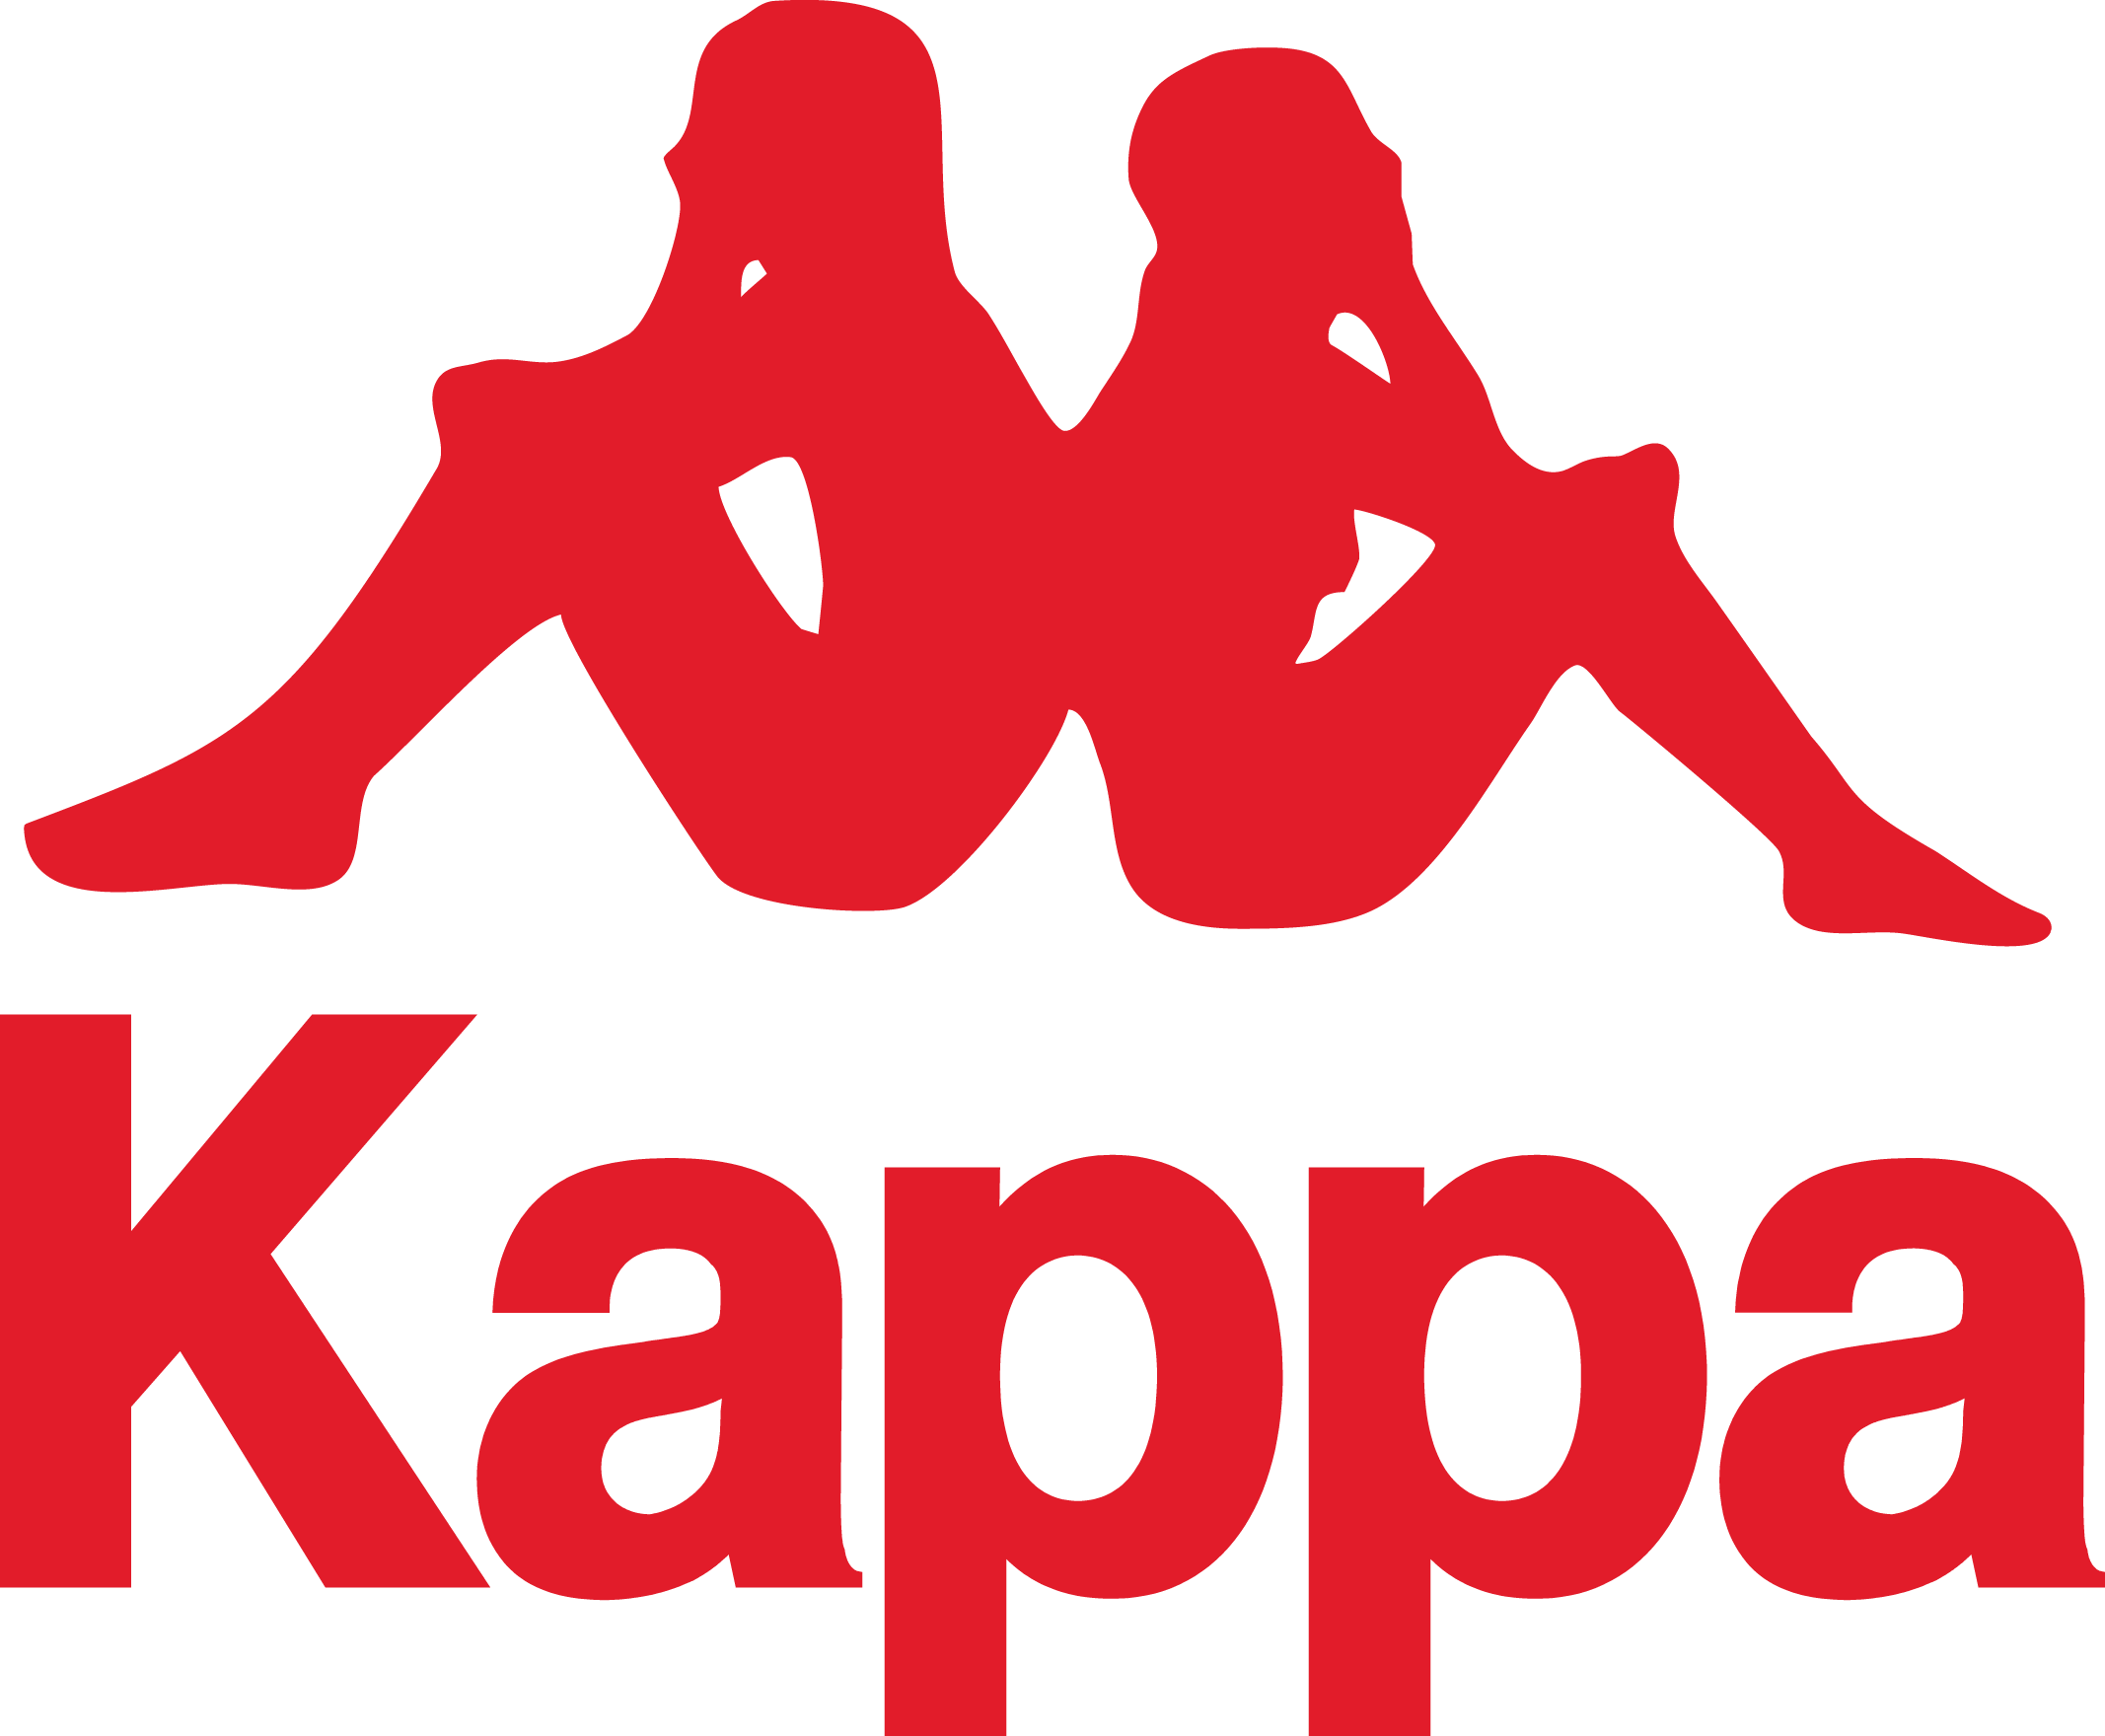 kappa logo pngsvg logo vector template free downloads